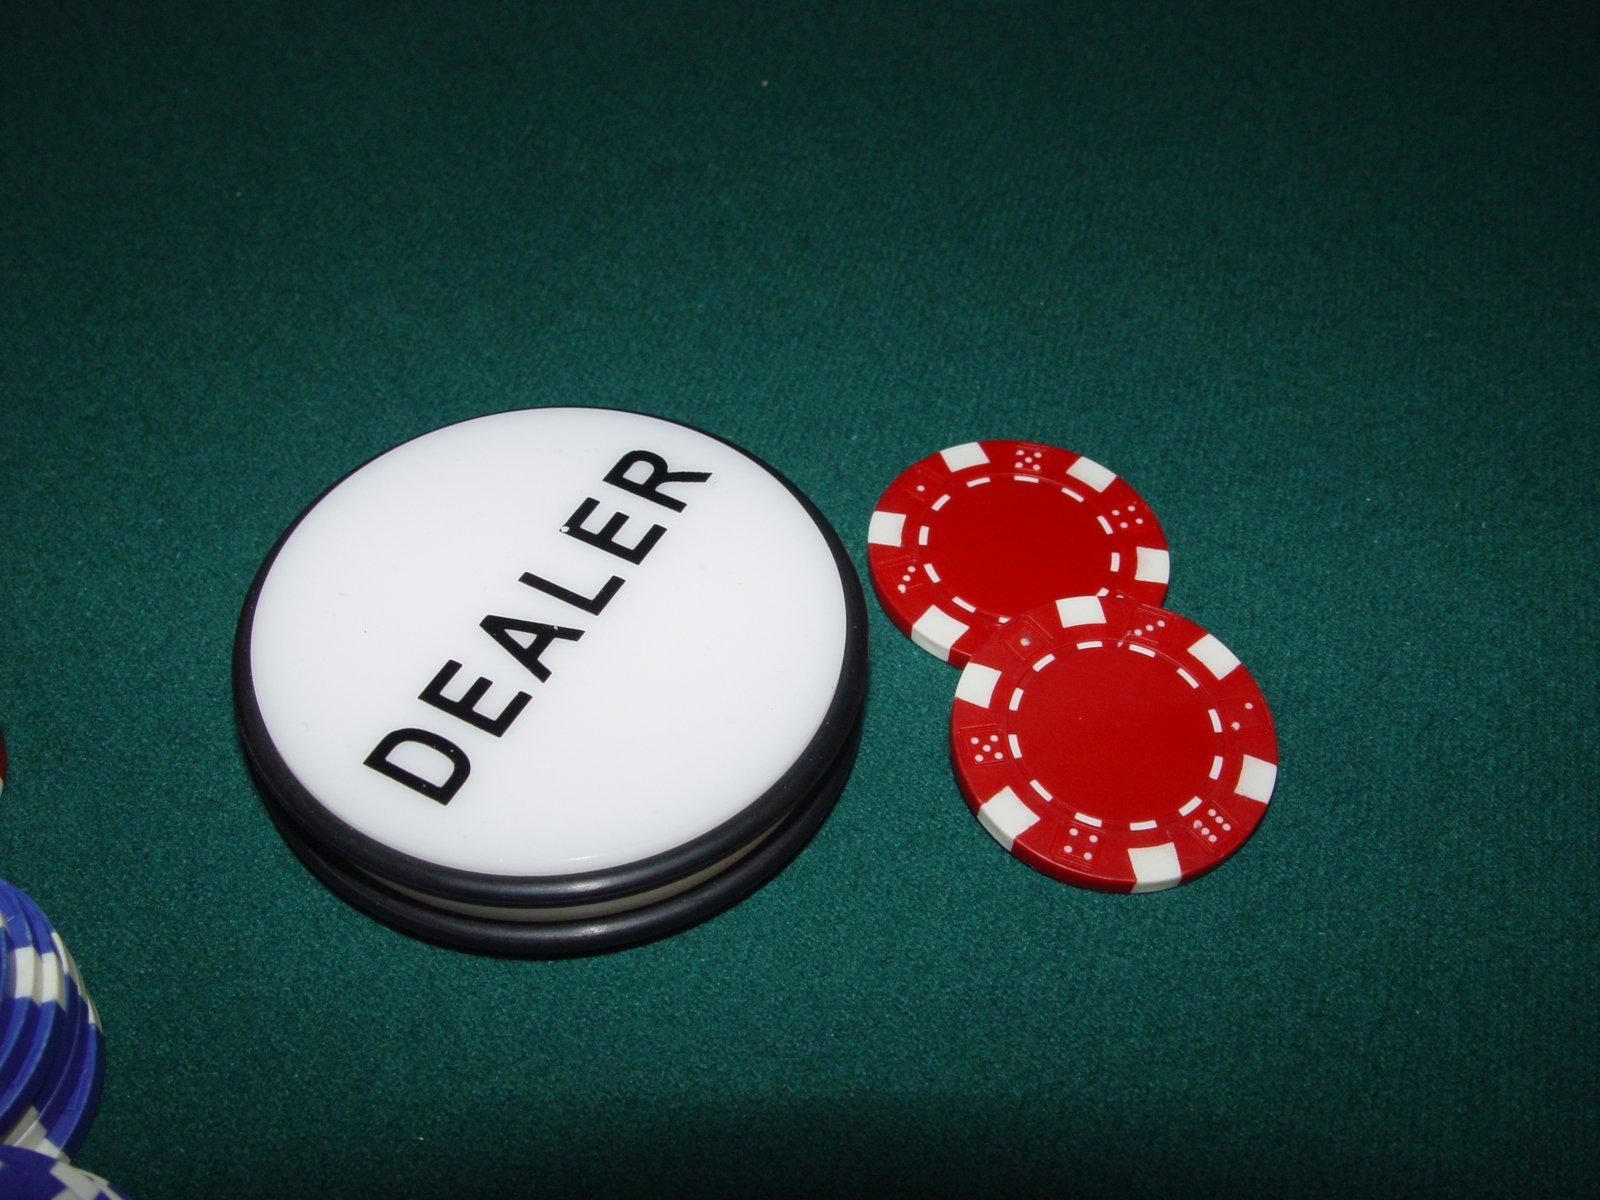 Gambling closer